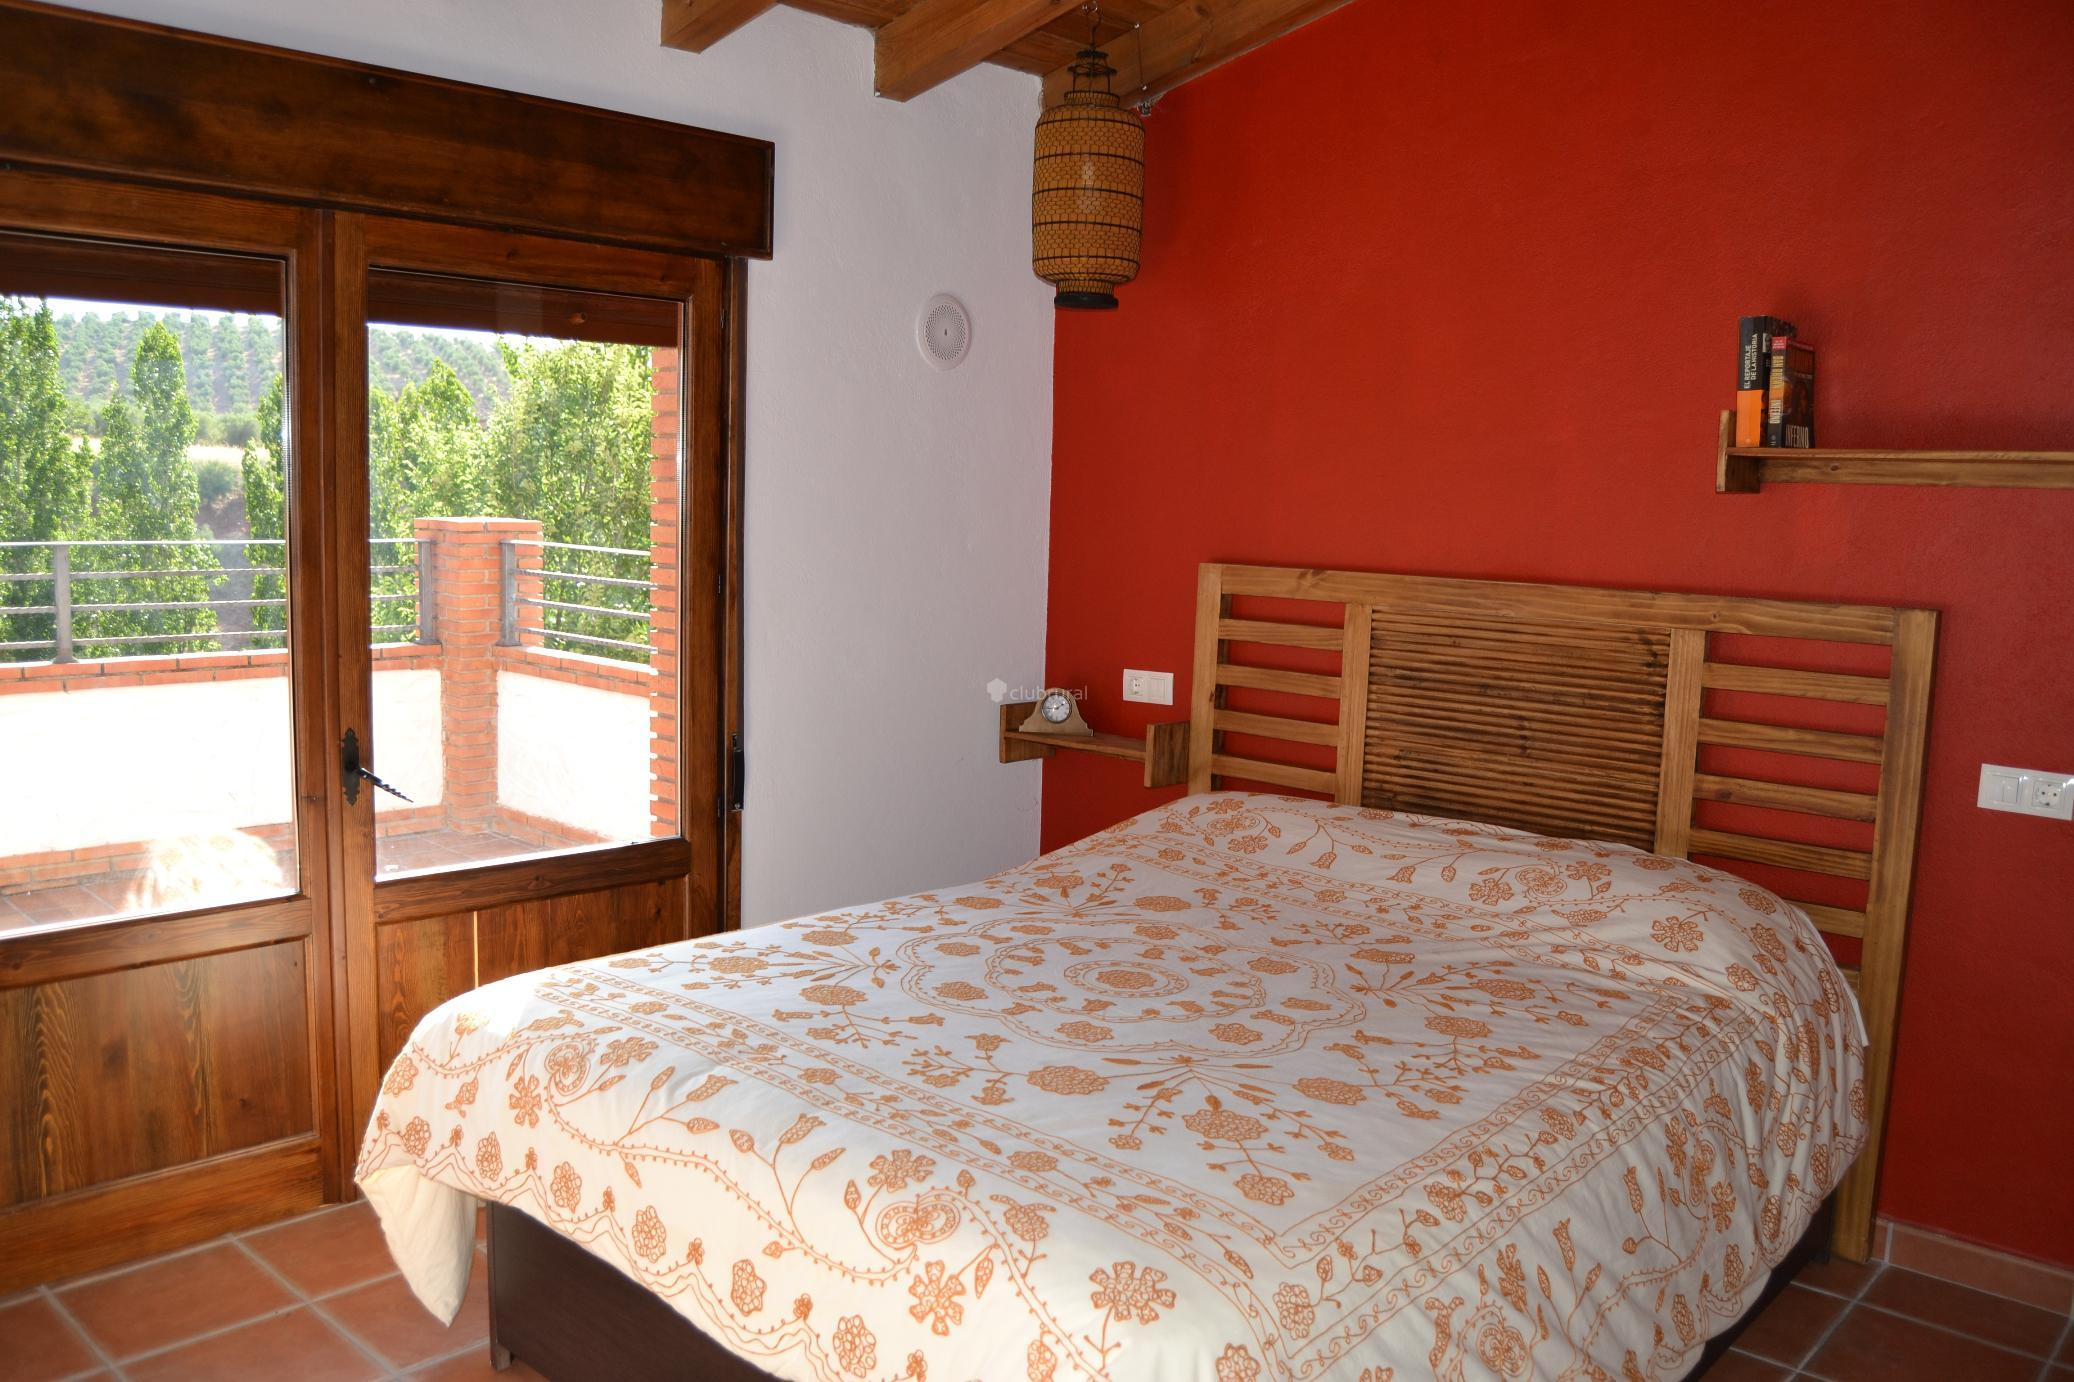 Fotos de casa rural albarderos la buhardilla ja n - Casas con buhardilla ...